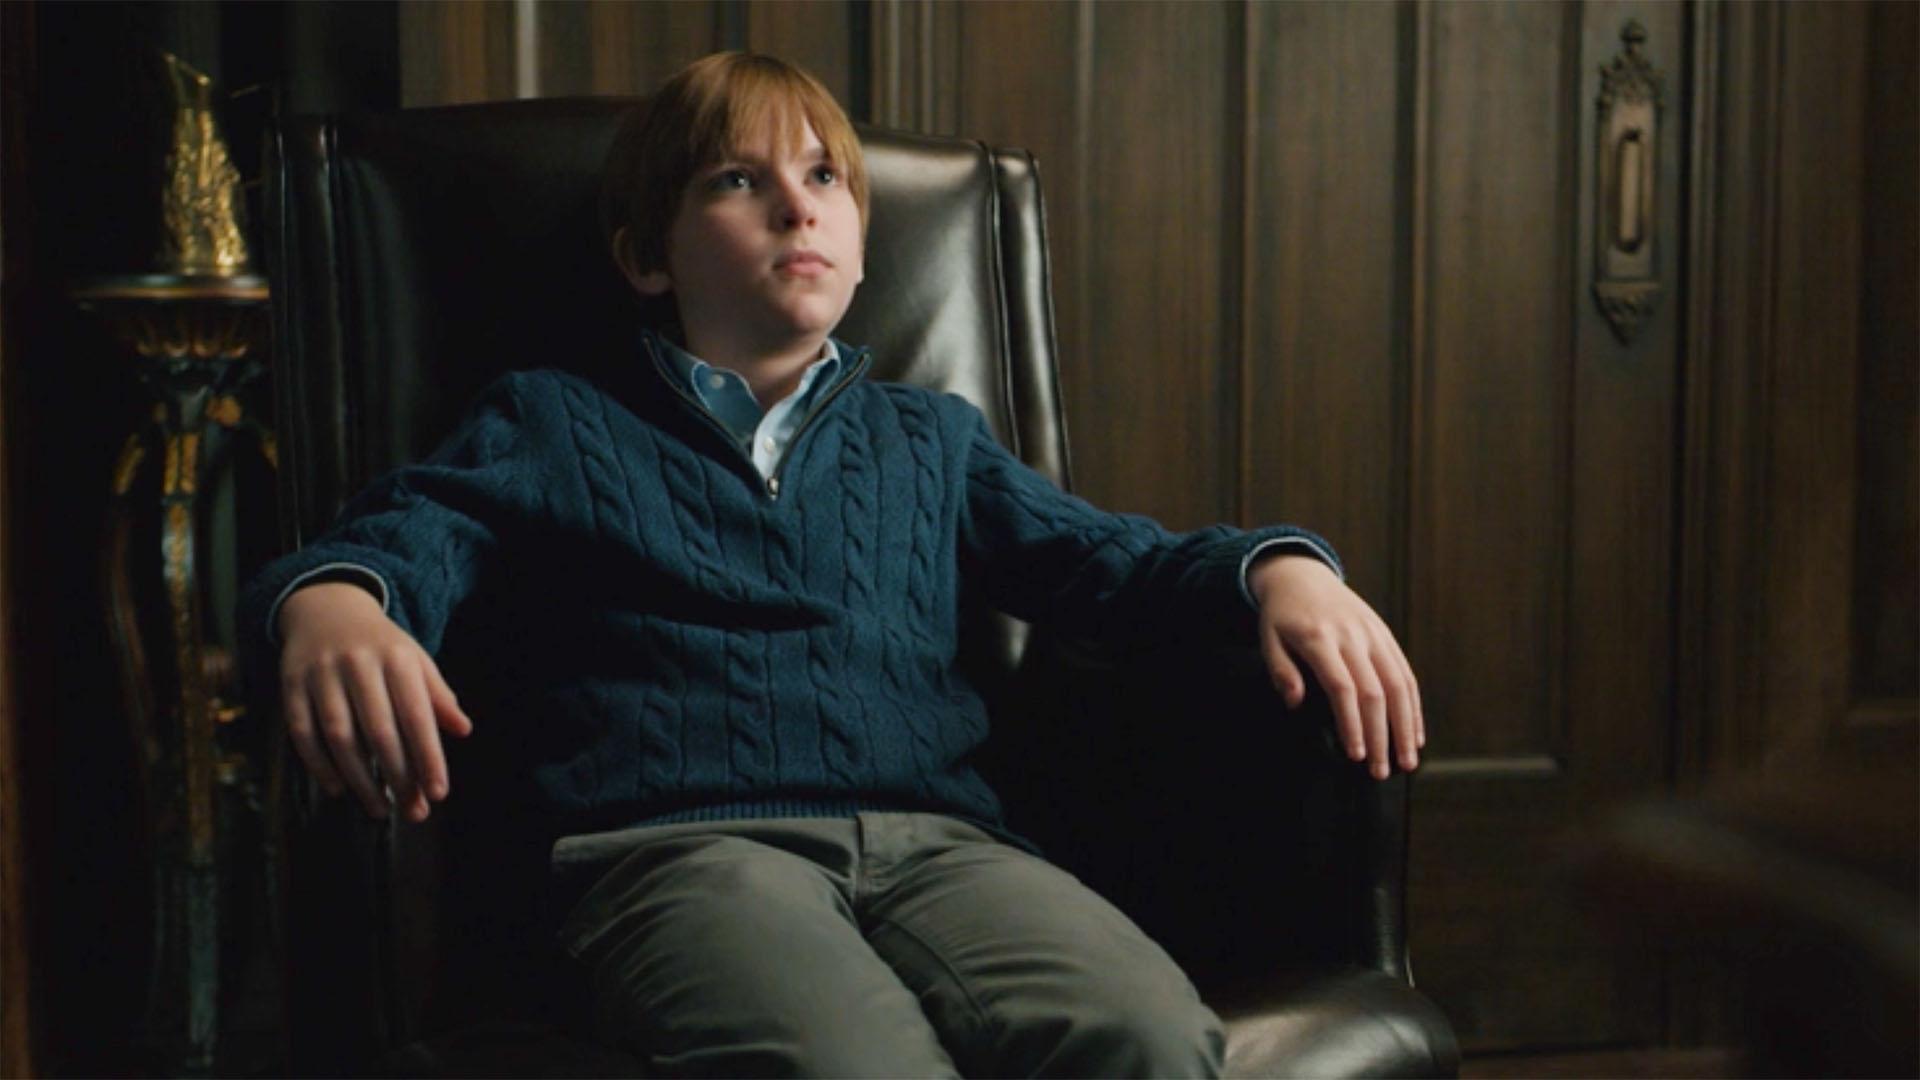 Luke Judy as Eric McCrystal